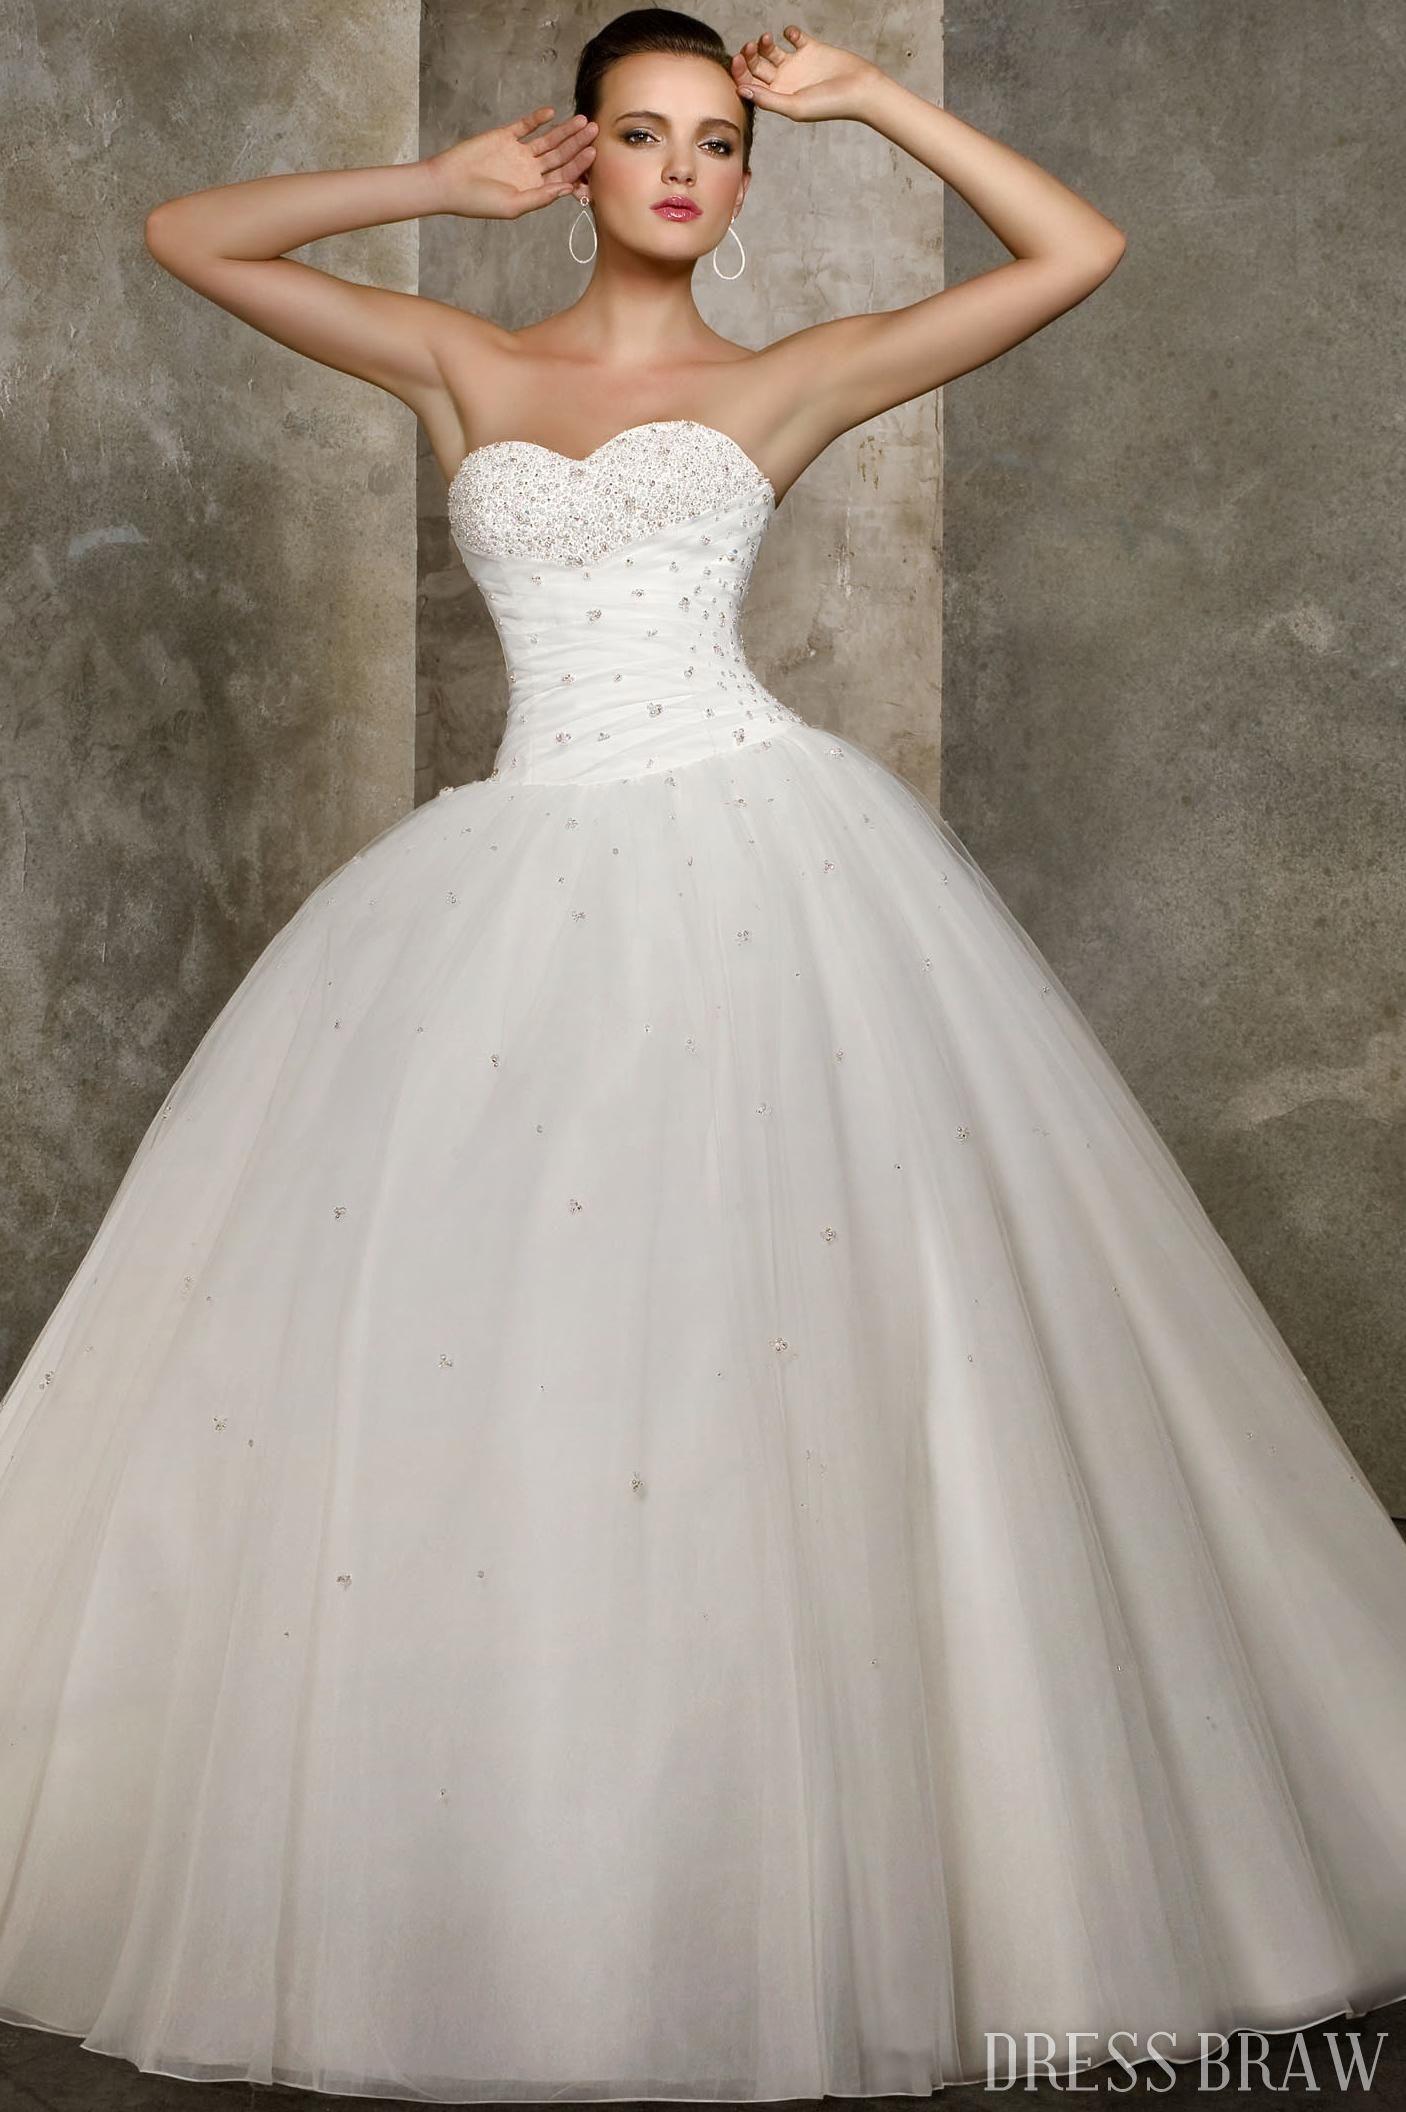 Ksl wedding dress  Krystle Gill gill on Pinterest